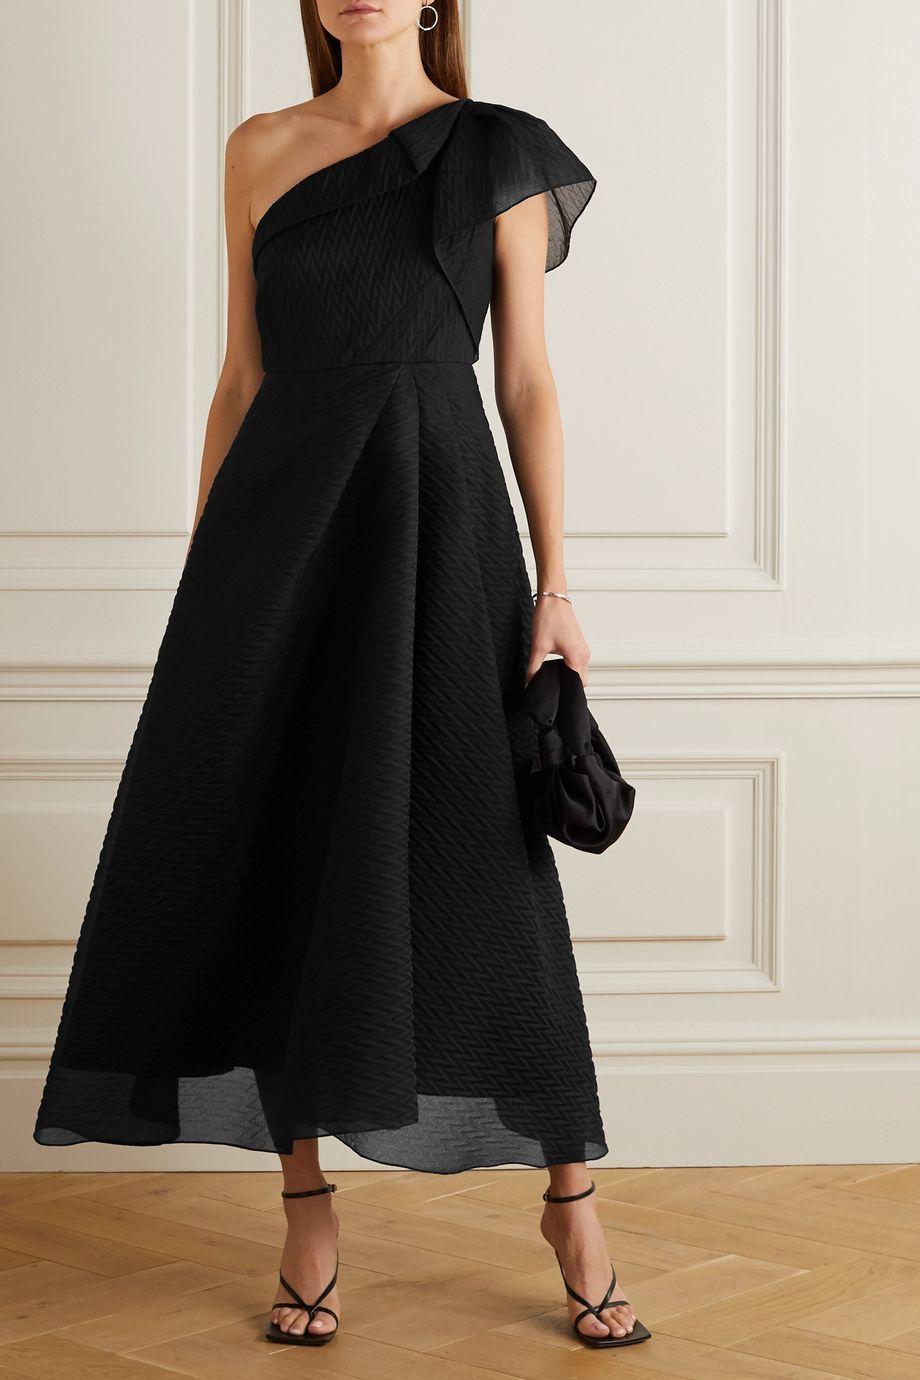 Black Ostuni One Shoulder Silk Blend Organza Jacquard Midi Dress Roland Mouret Net A Porter Pakaian Pesta Gaun Pakaian [ 1380 x 920 Pixel ]